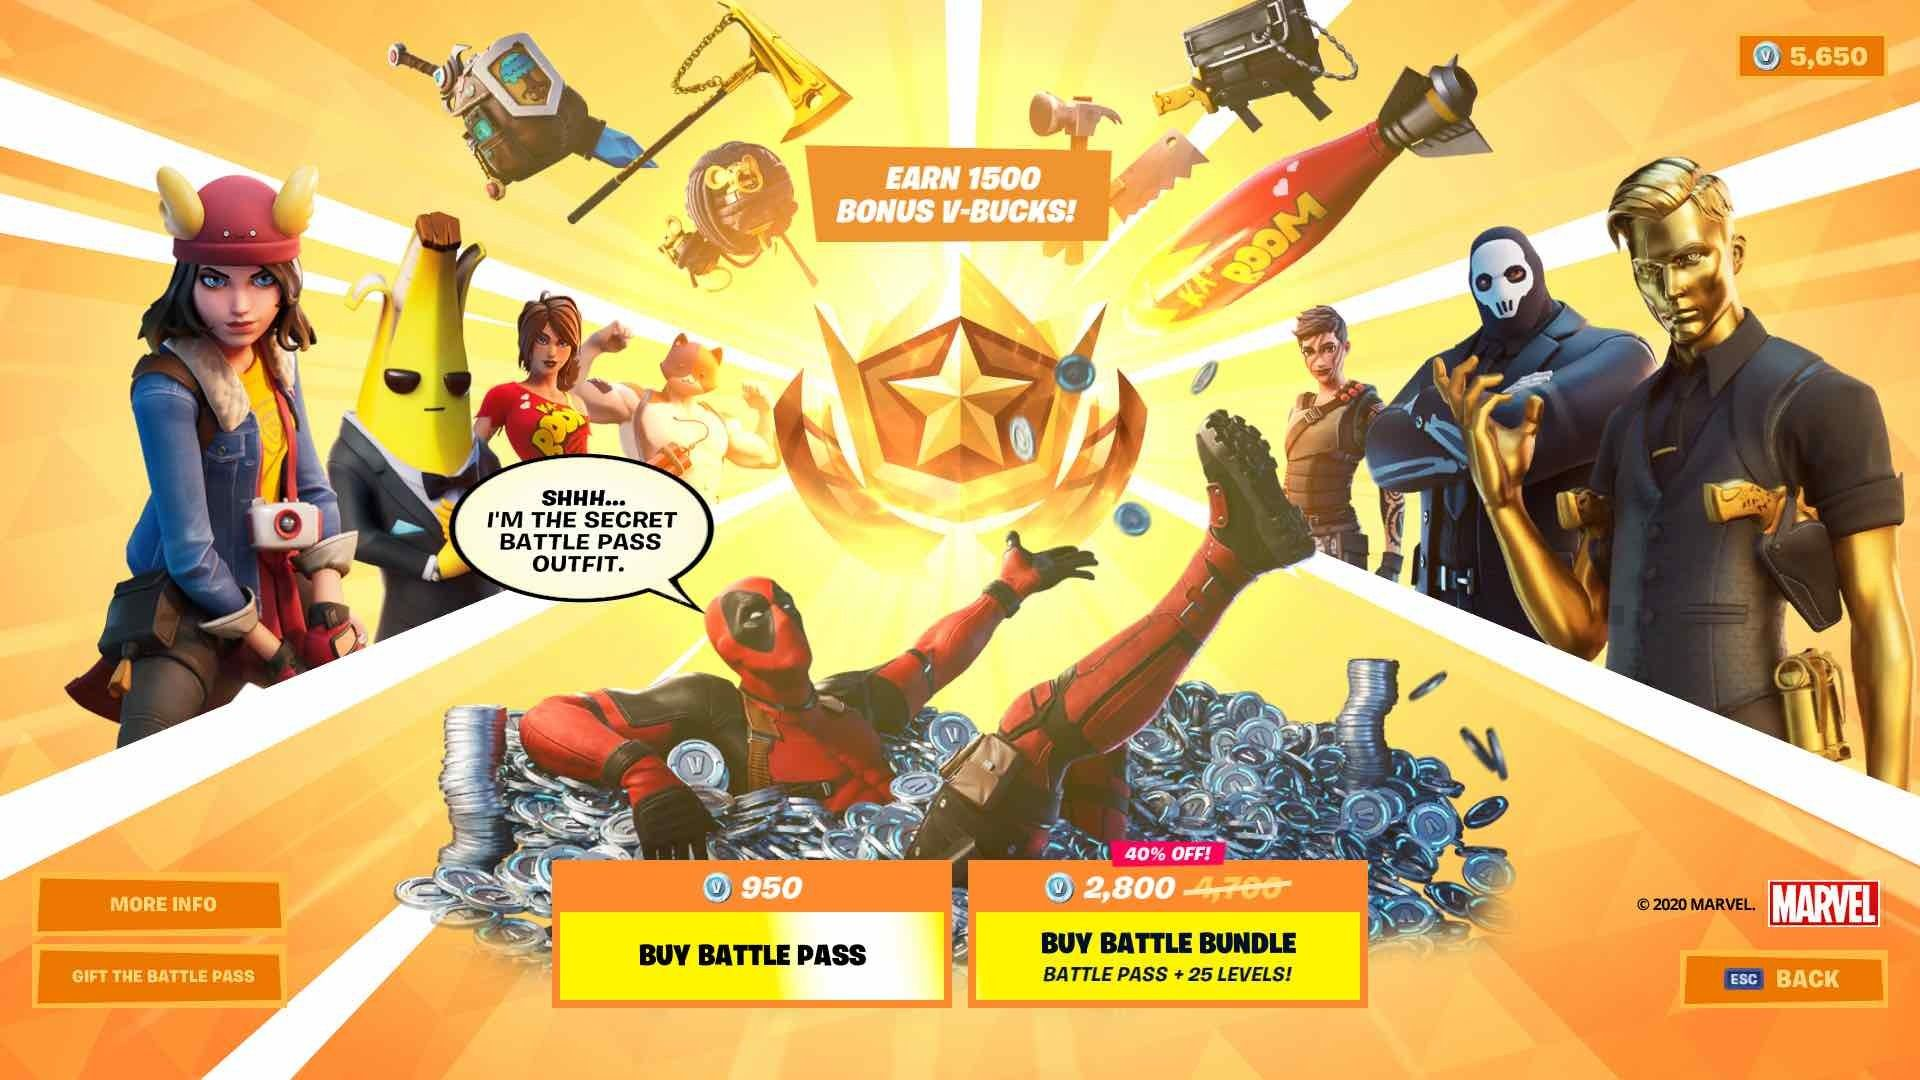 Get Unlimited Free V Bucks Chapter 2 Season 2 With Fortnite V Bucks Generator In 2020 Fortnite Deadpool Skin Video Game Movies